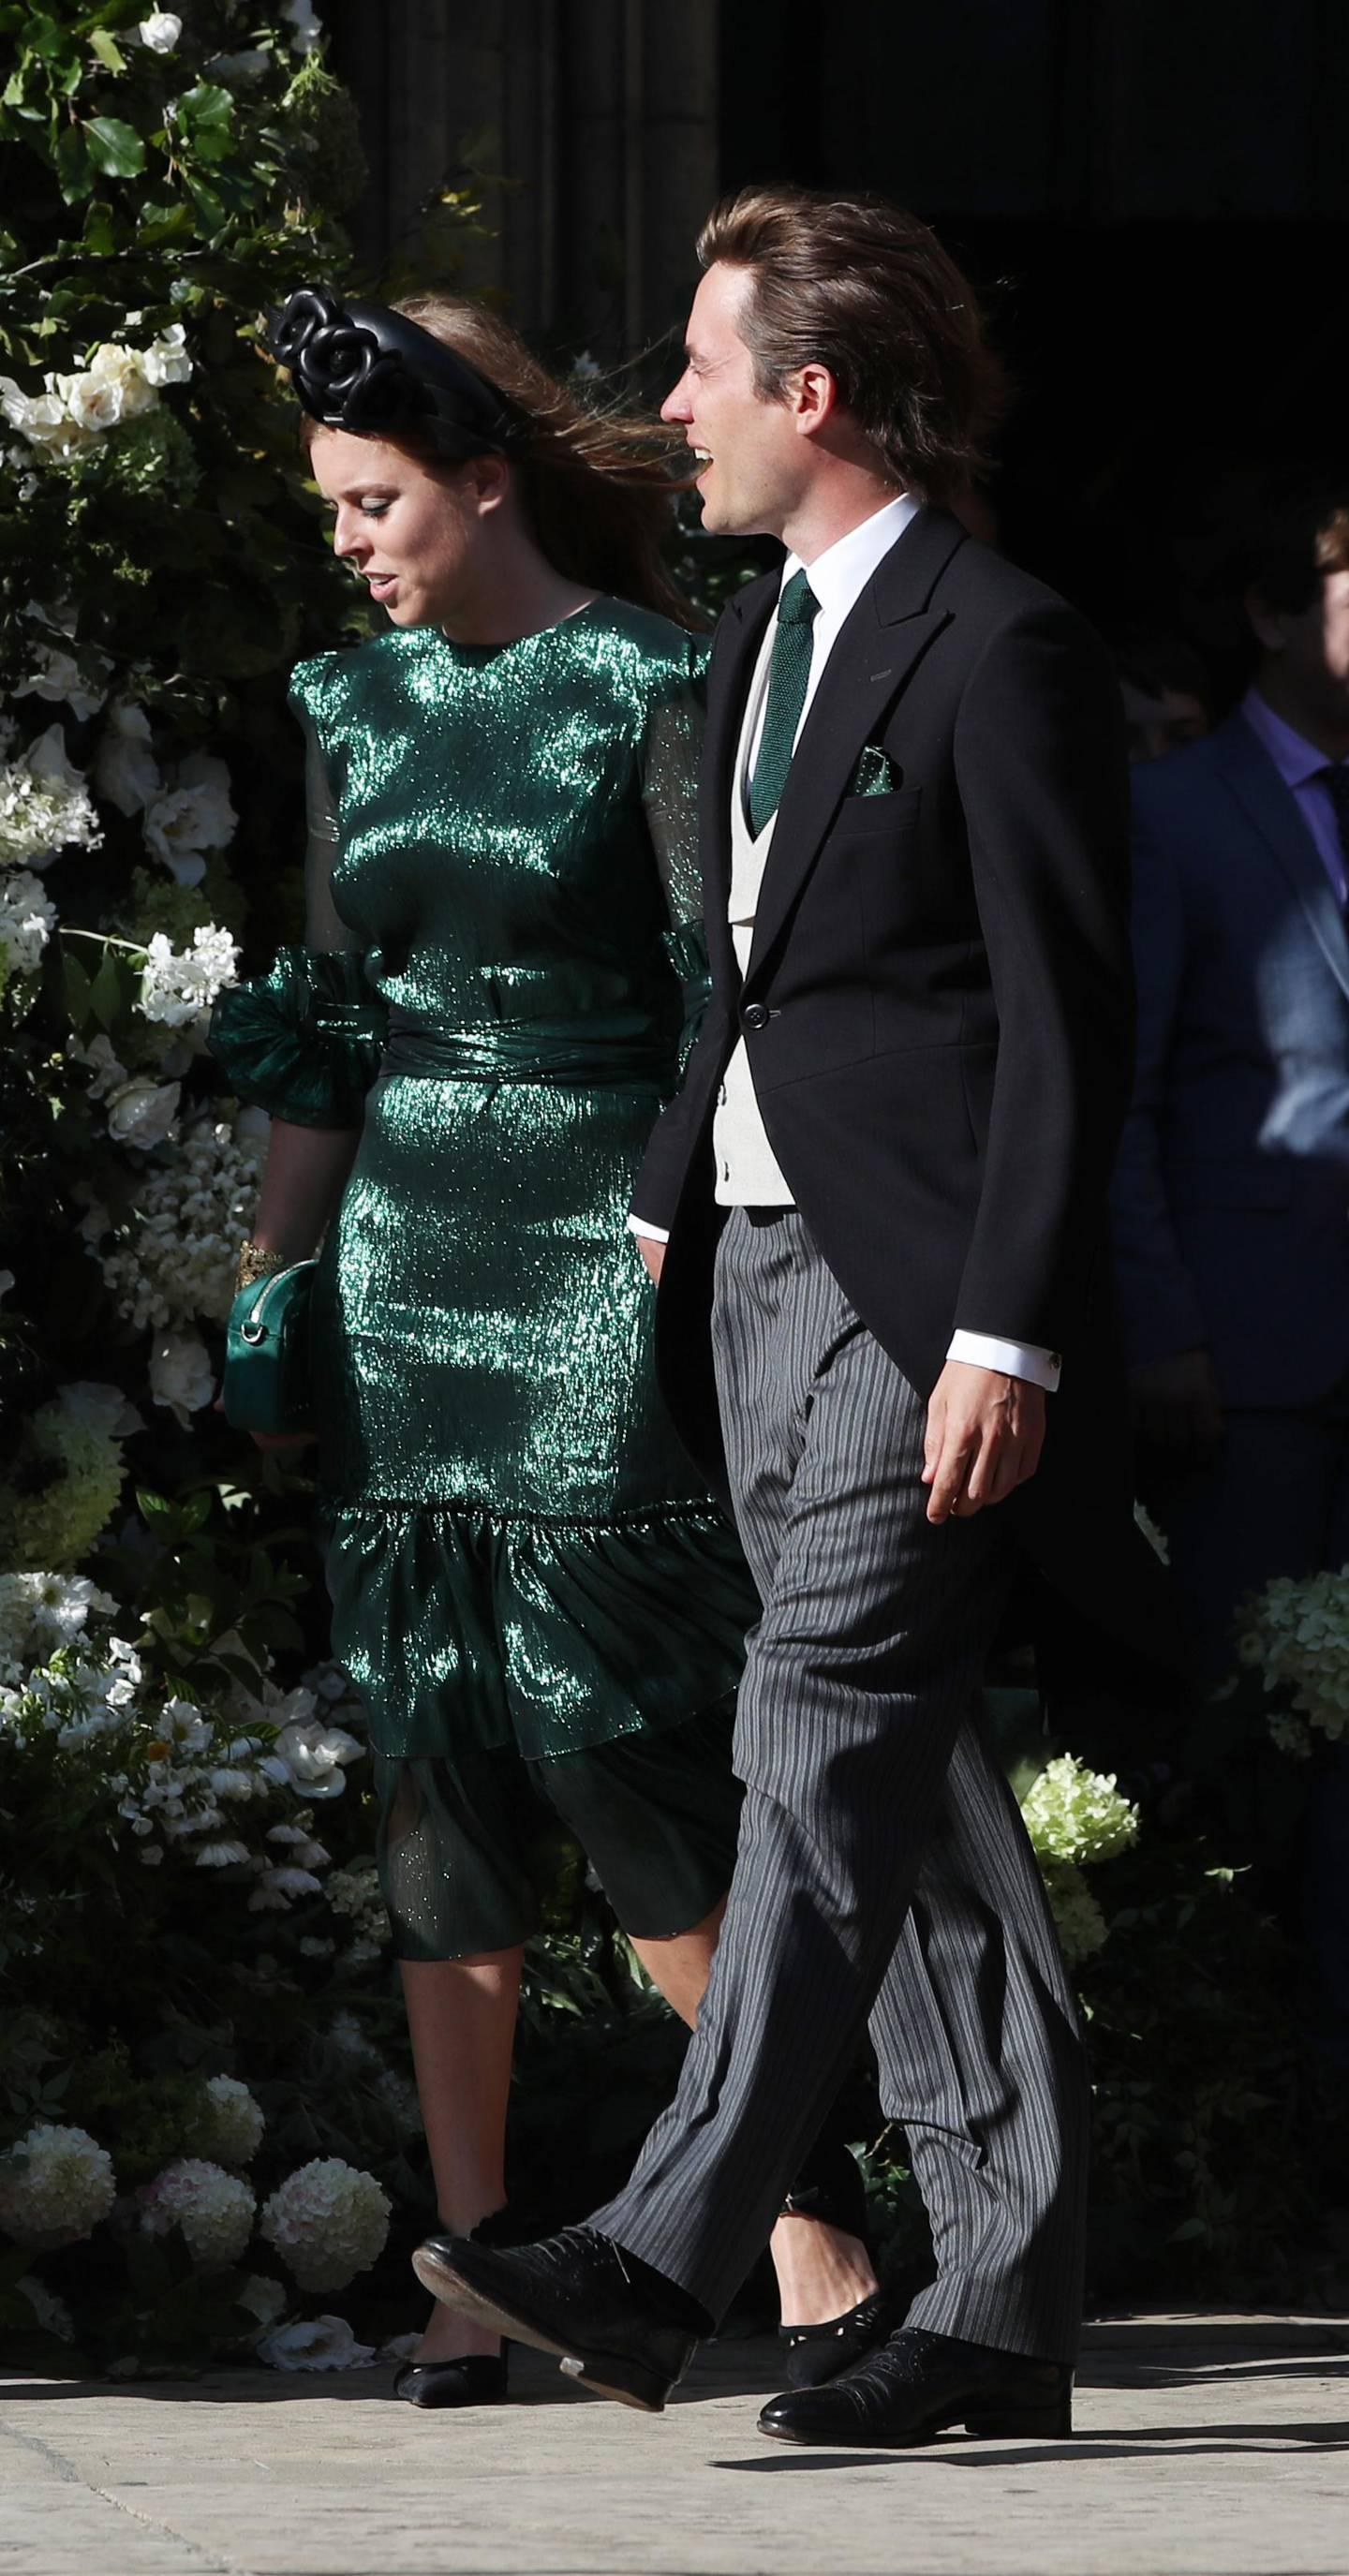 Princess Beatrice of York leaves York Minster after the wedding of Ellie Goulding and Caspar Jopling. (Photo by Peter Byrne/PA Images via Getty Images)